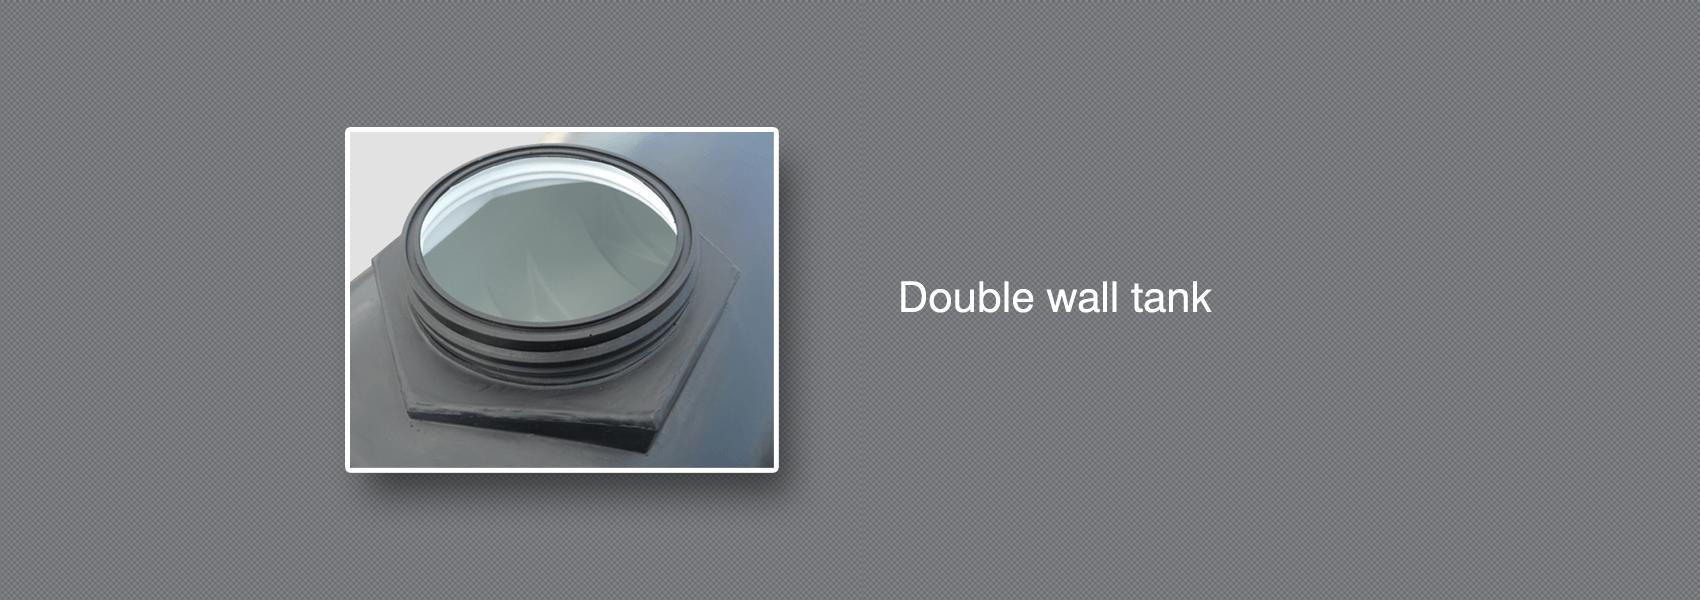 Double wall tank